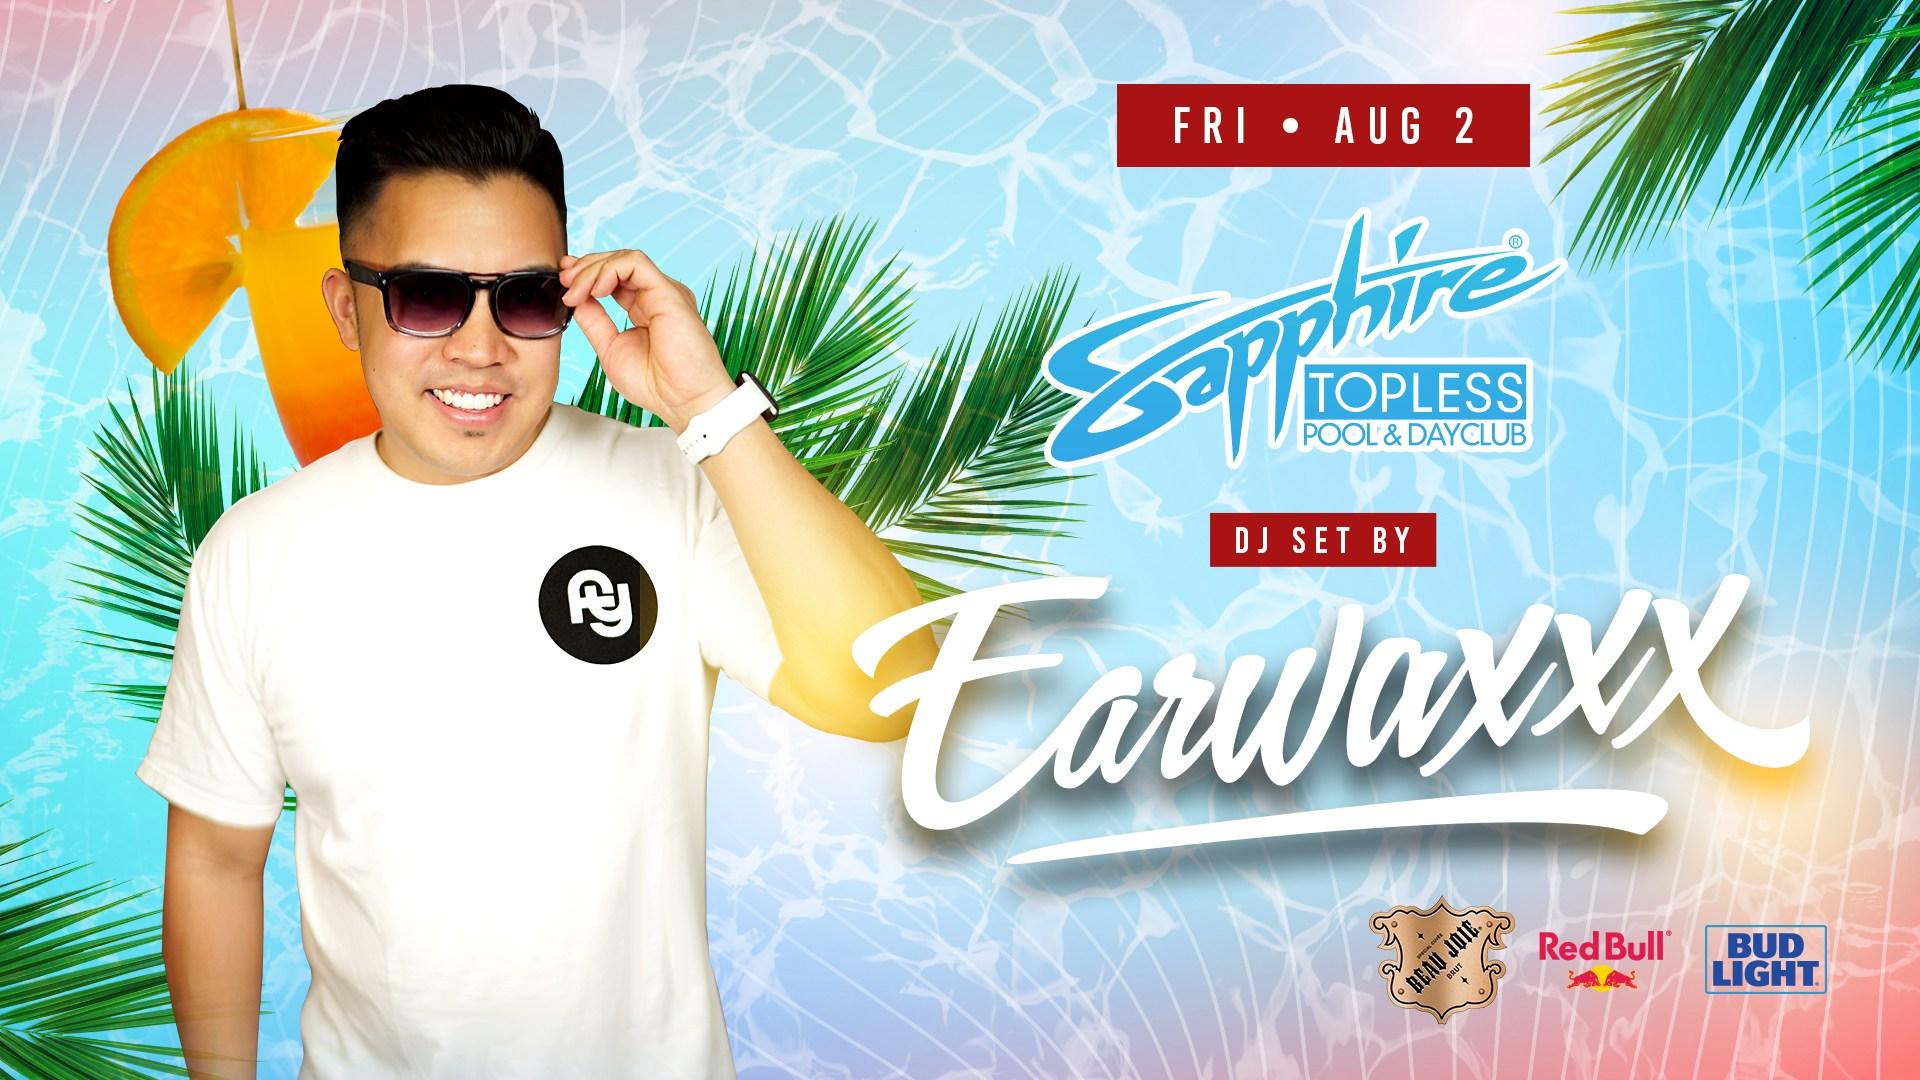 DJ Set by DJ EarWaxx